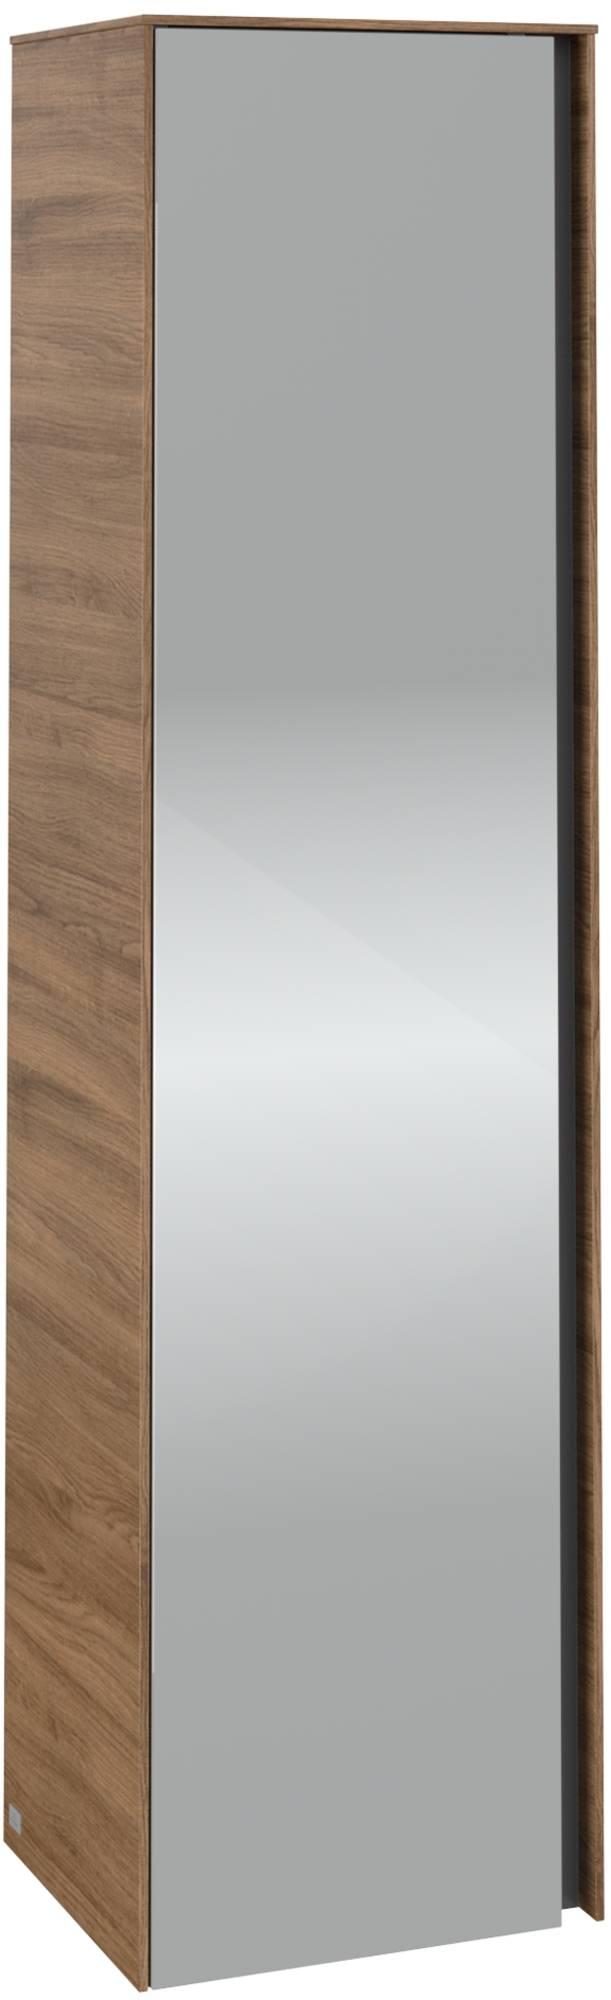 Villeroy & Boch Collaro Hoge kast 40,4x34,9x153,8 cm Oak Kansas